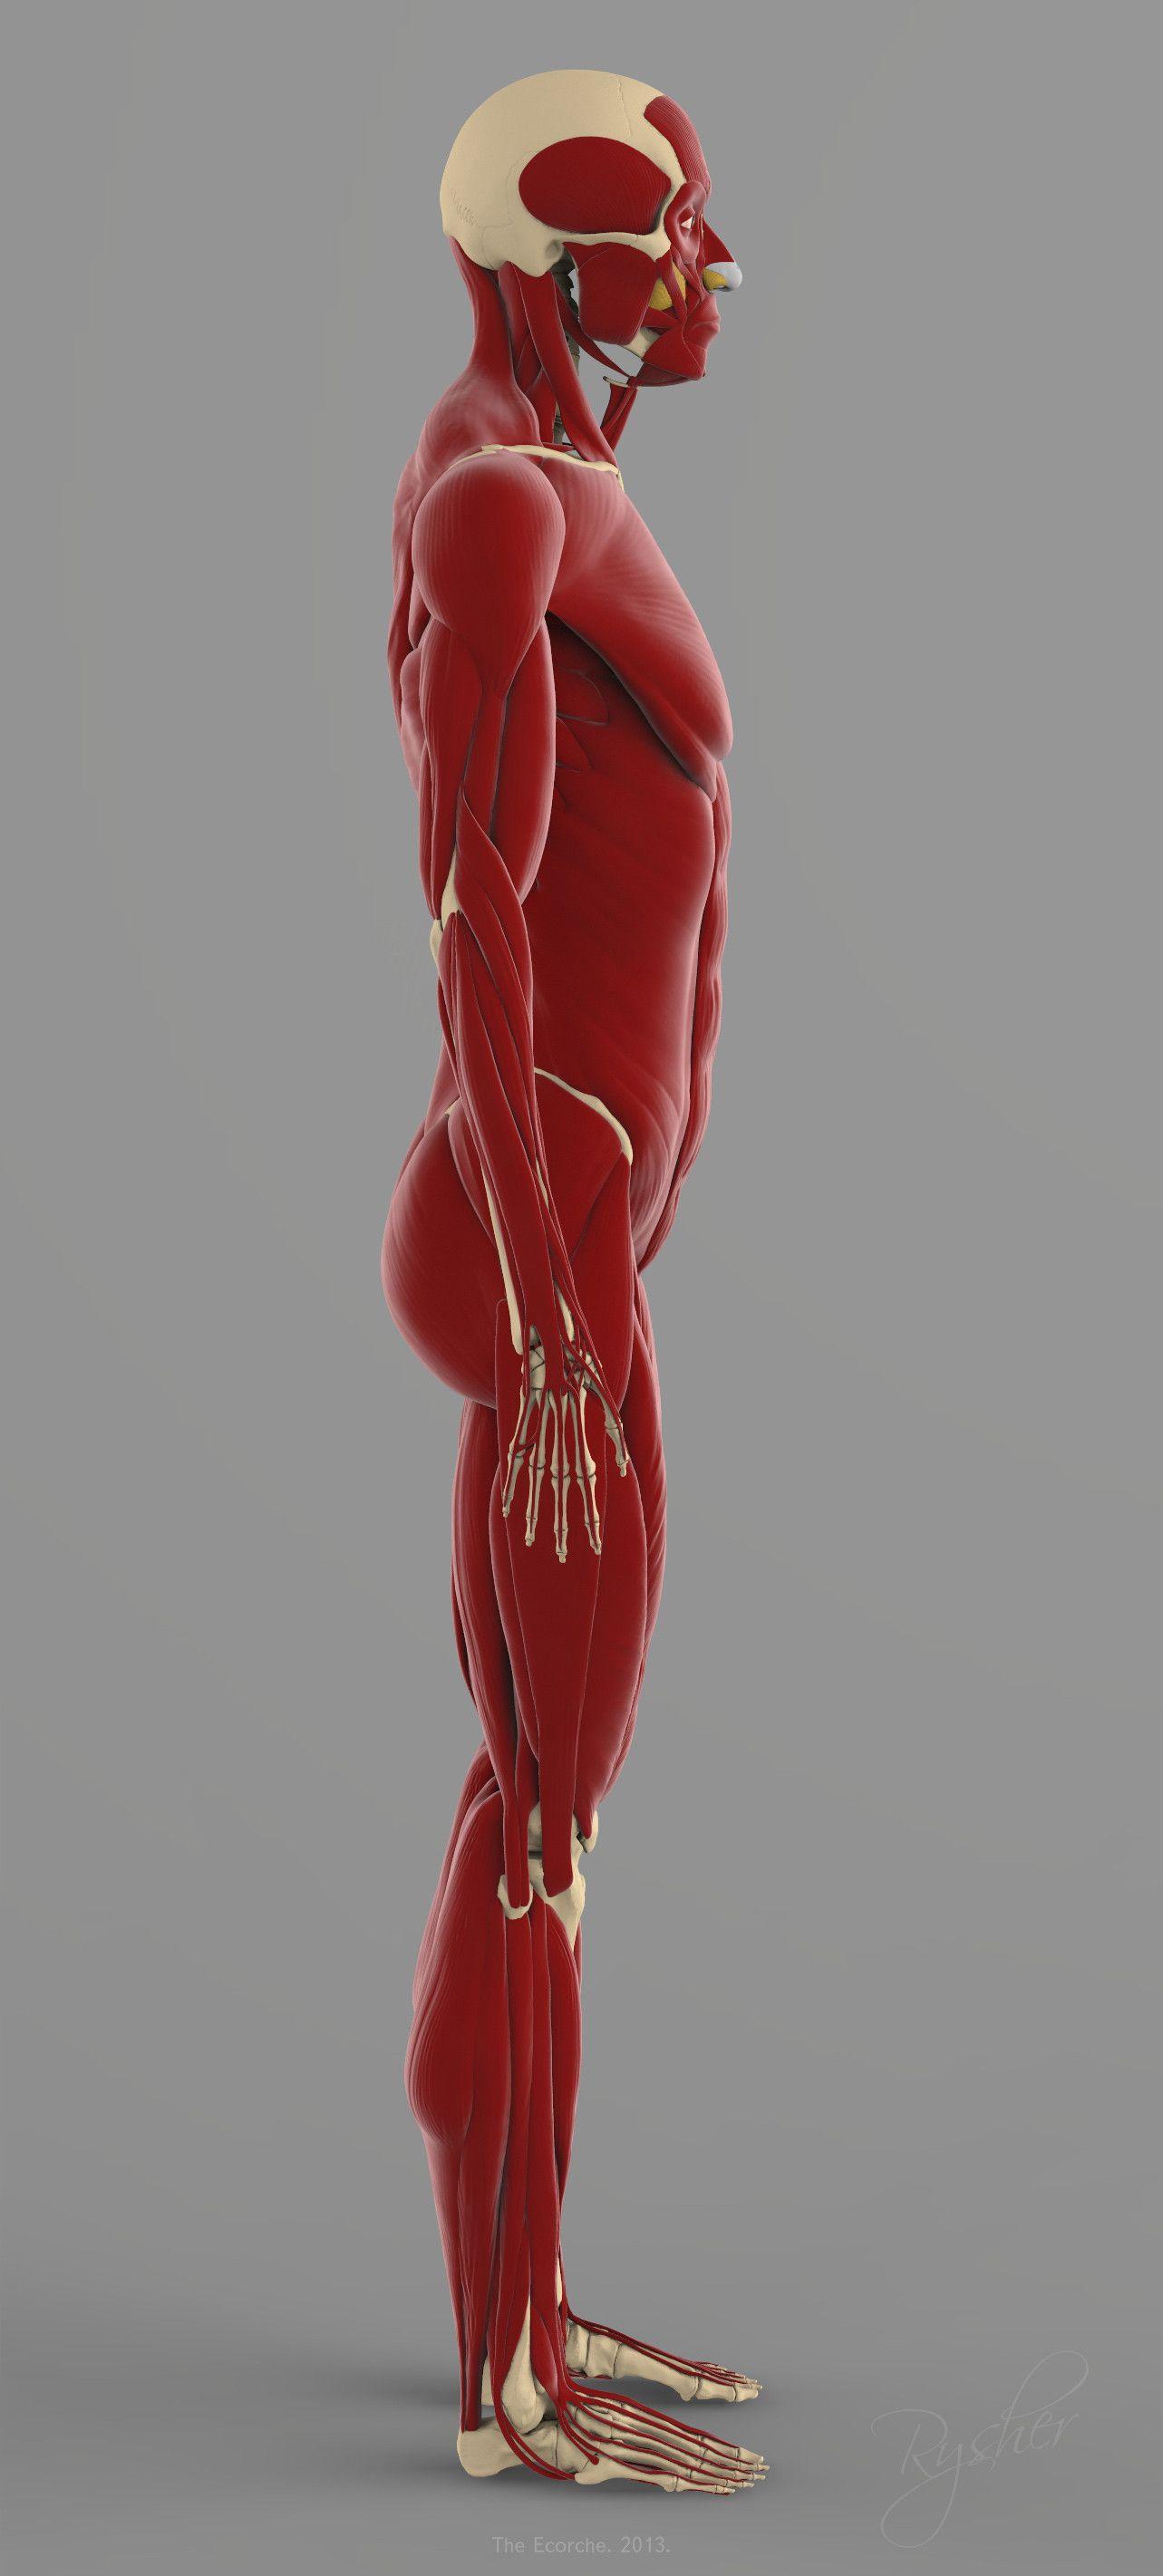 precise human skeleton muscles 3d model | drawings | Pinterest ...